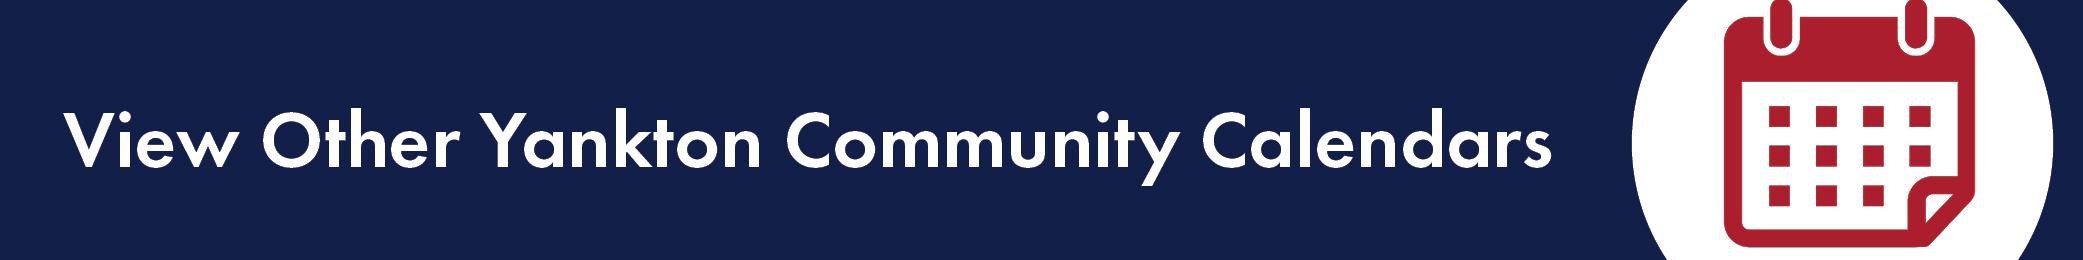 other community calendars